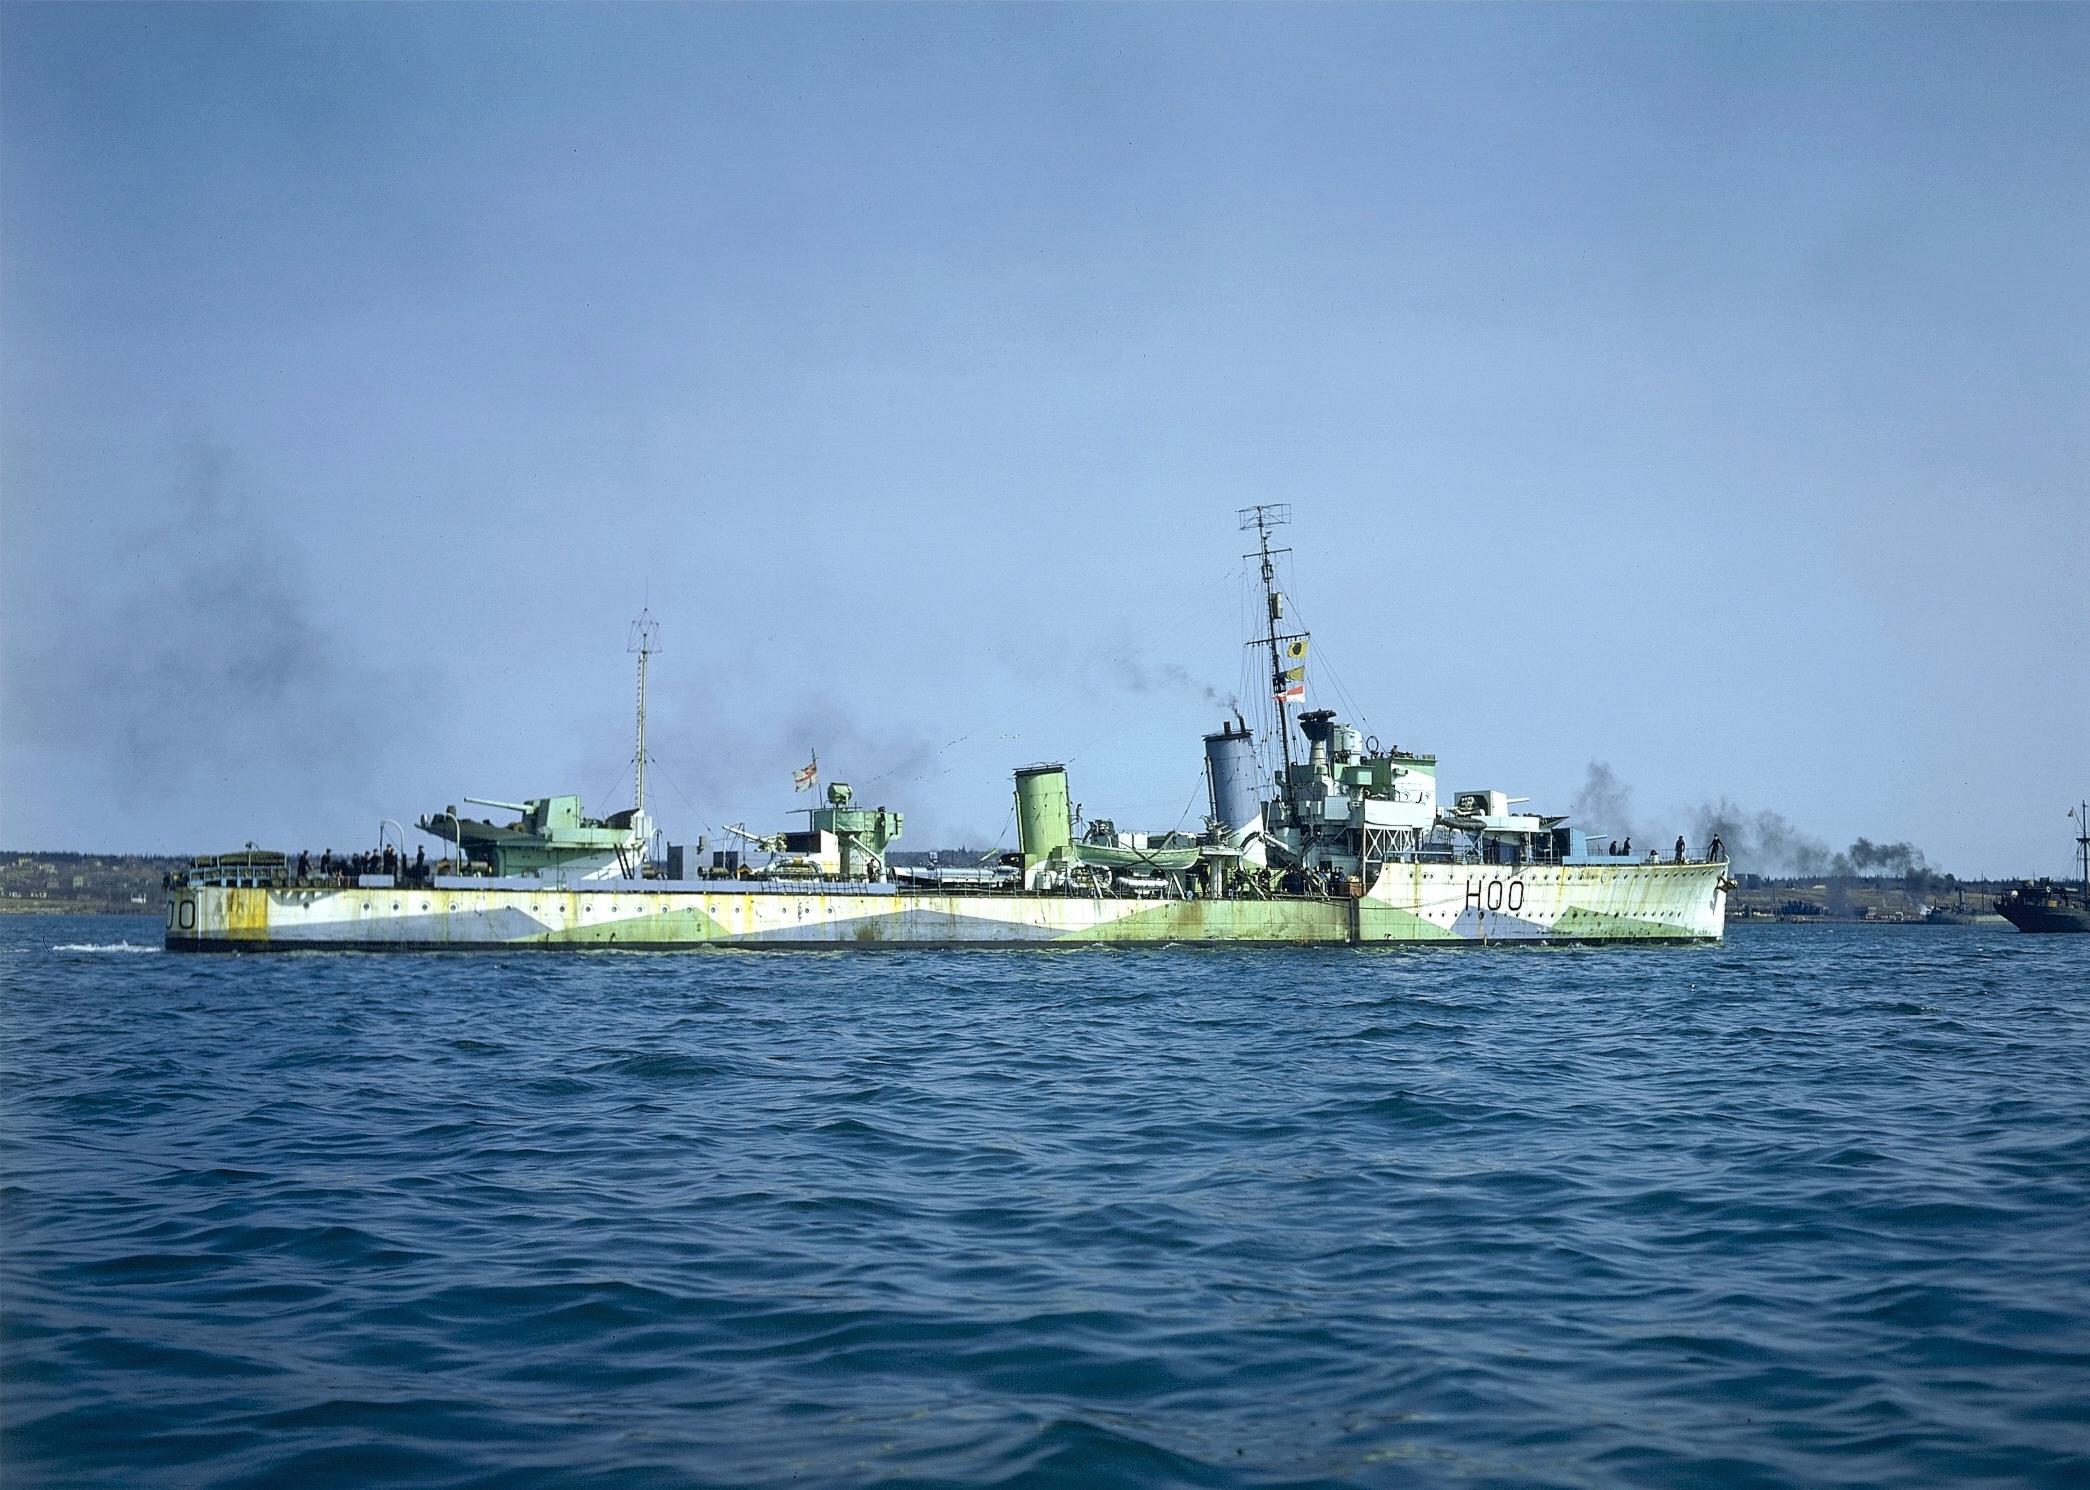 HMCS_Restigouche_(H00)_CT-284.jpg